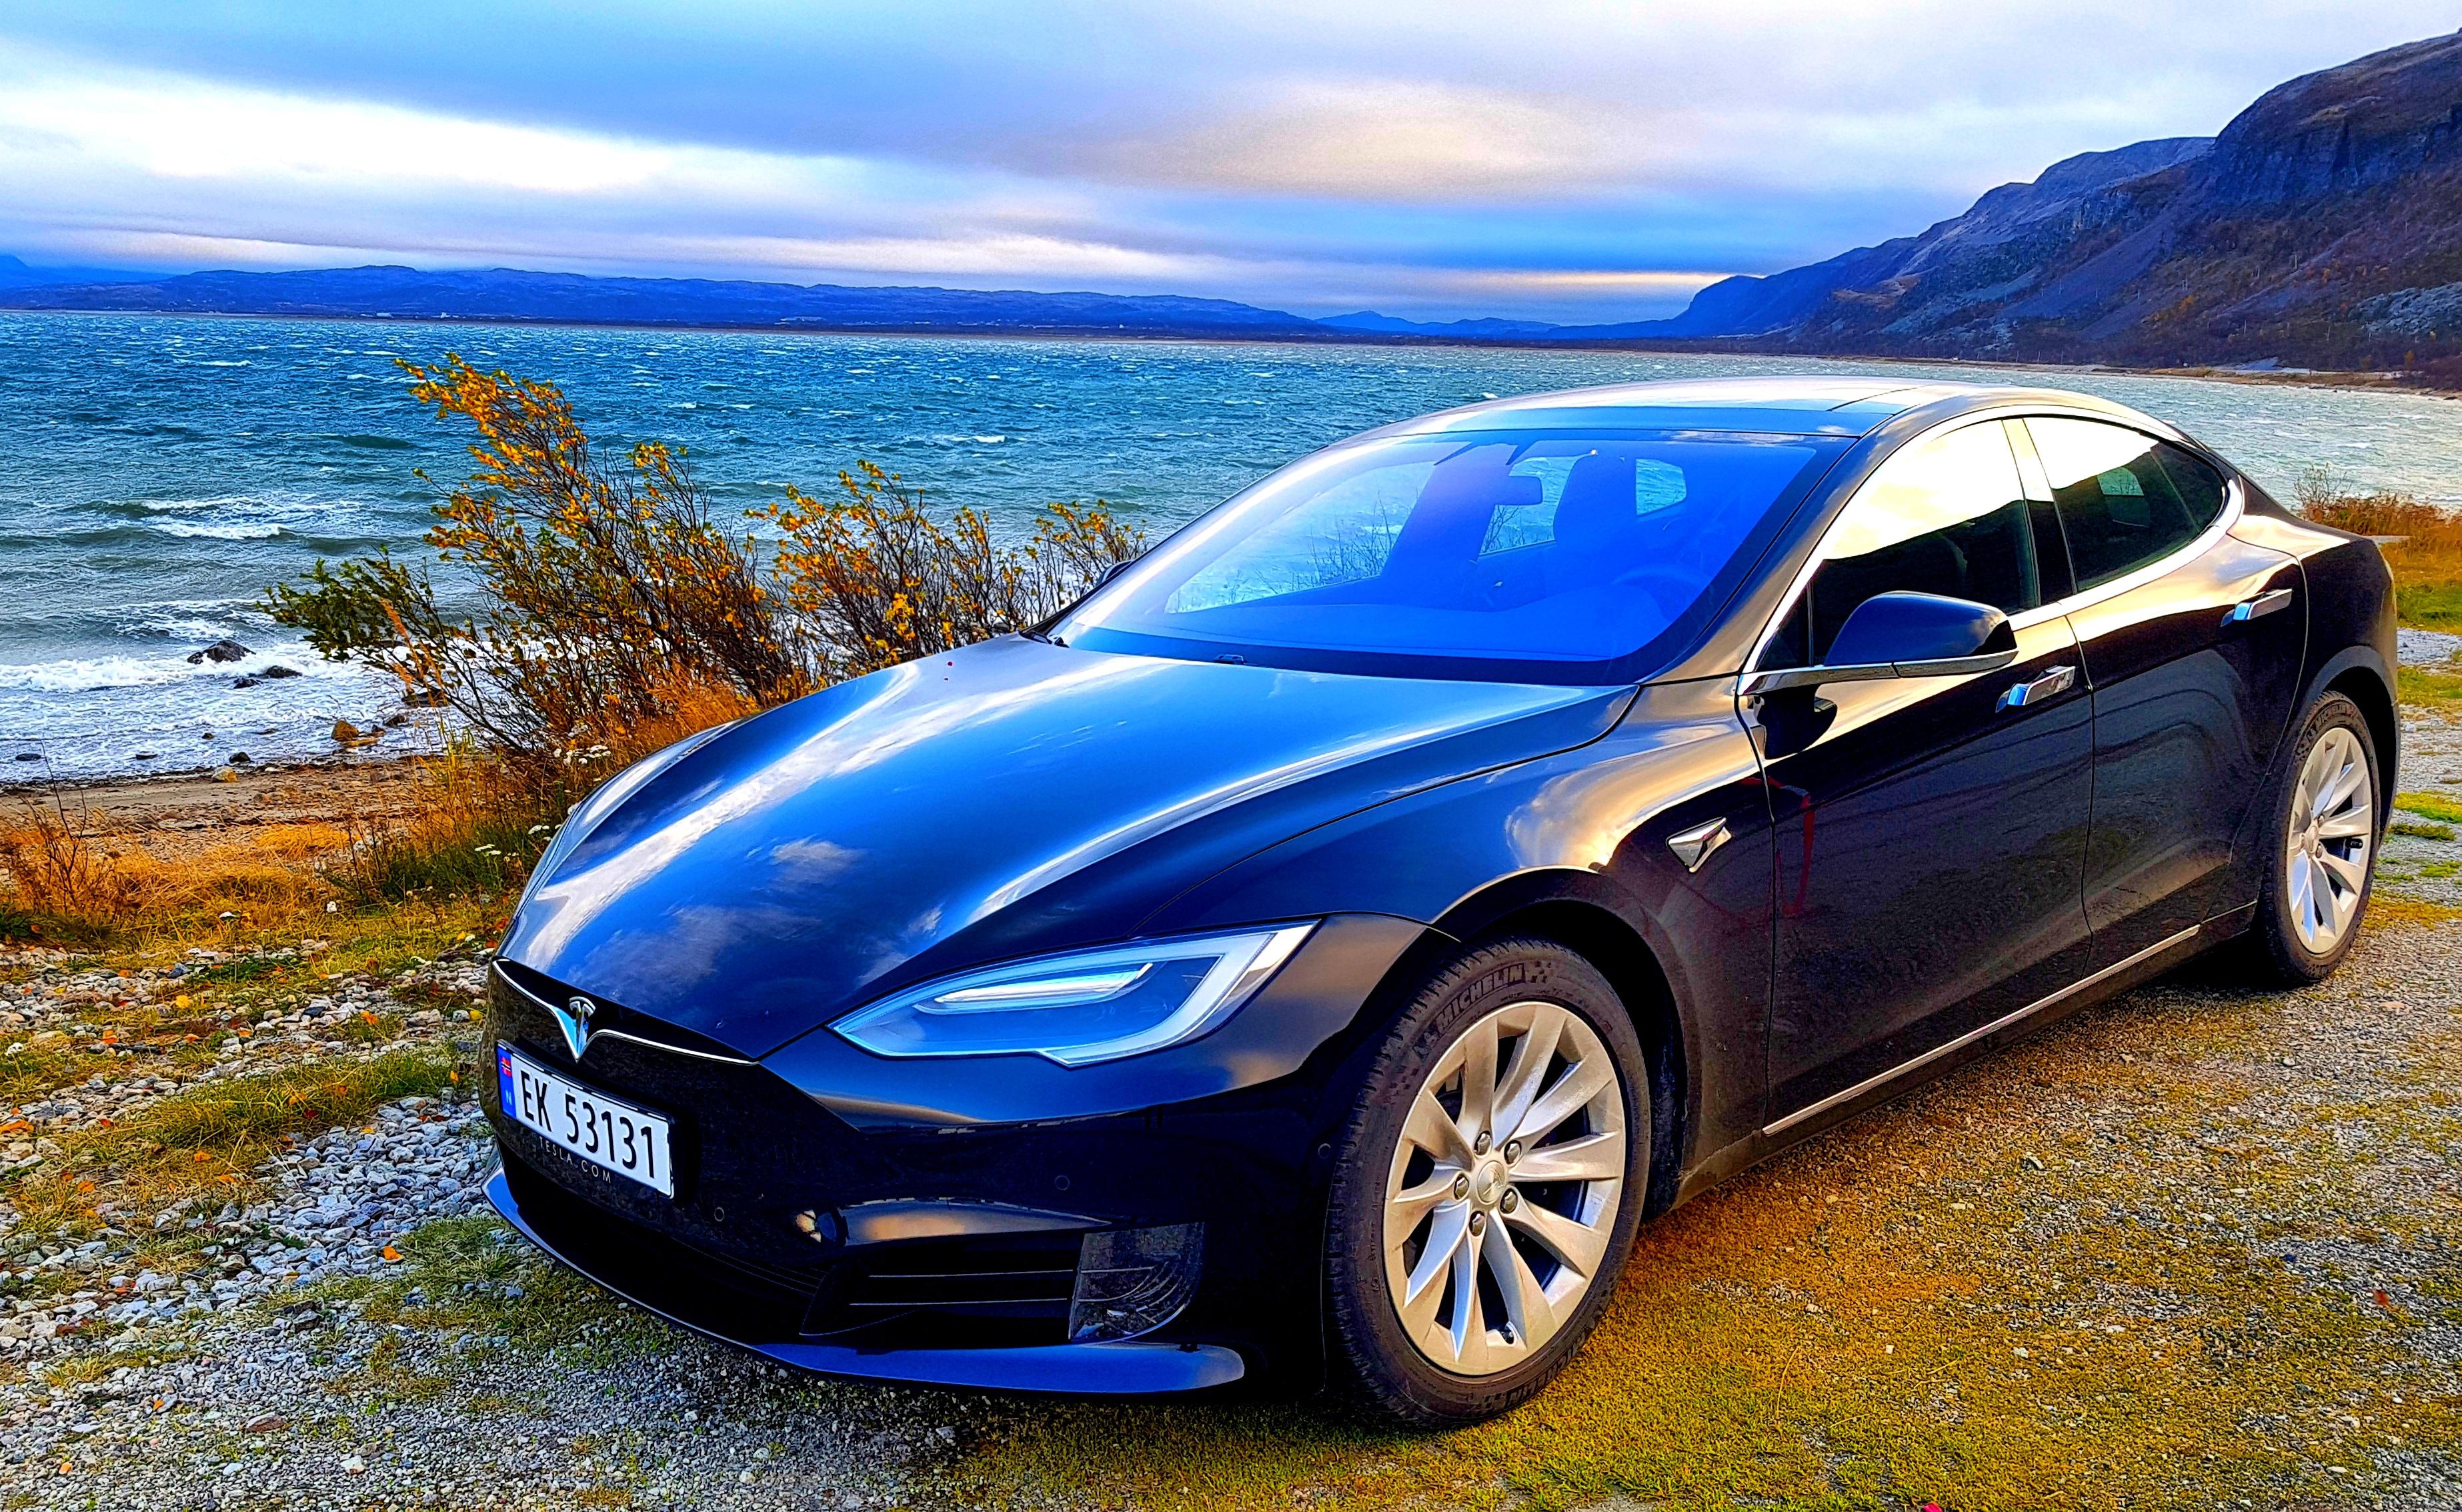 Eirin Isaksen IMG_20171002_161153_238 - Tesla Owners Club ...